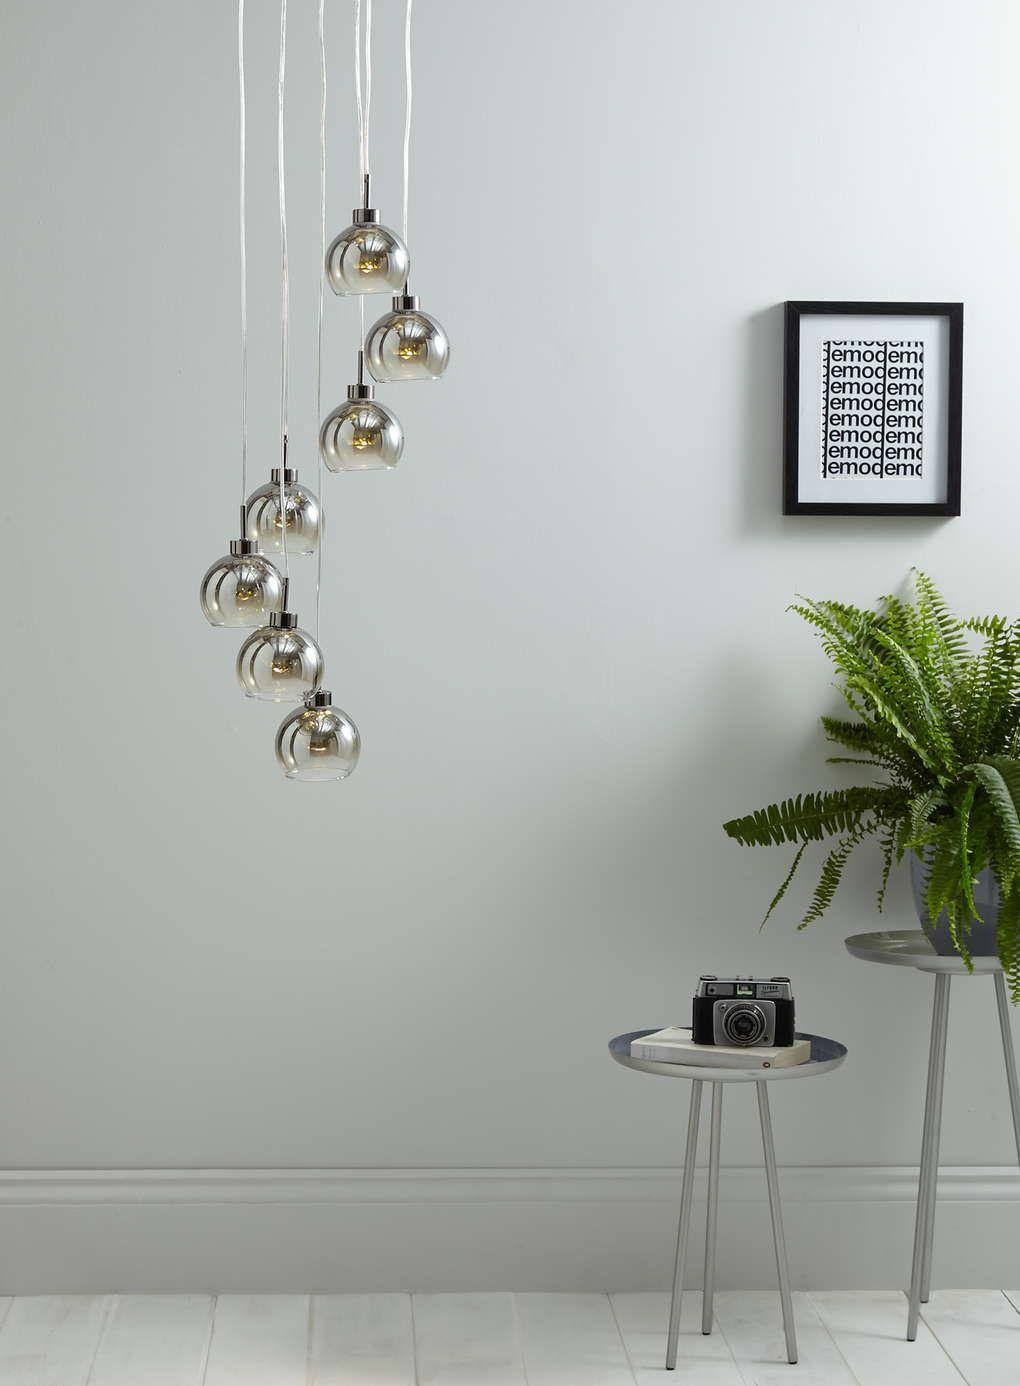 Senna LED Cluster Ceiling Light - View All Lighting & Bulbs - Home ...